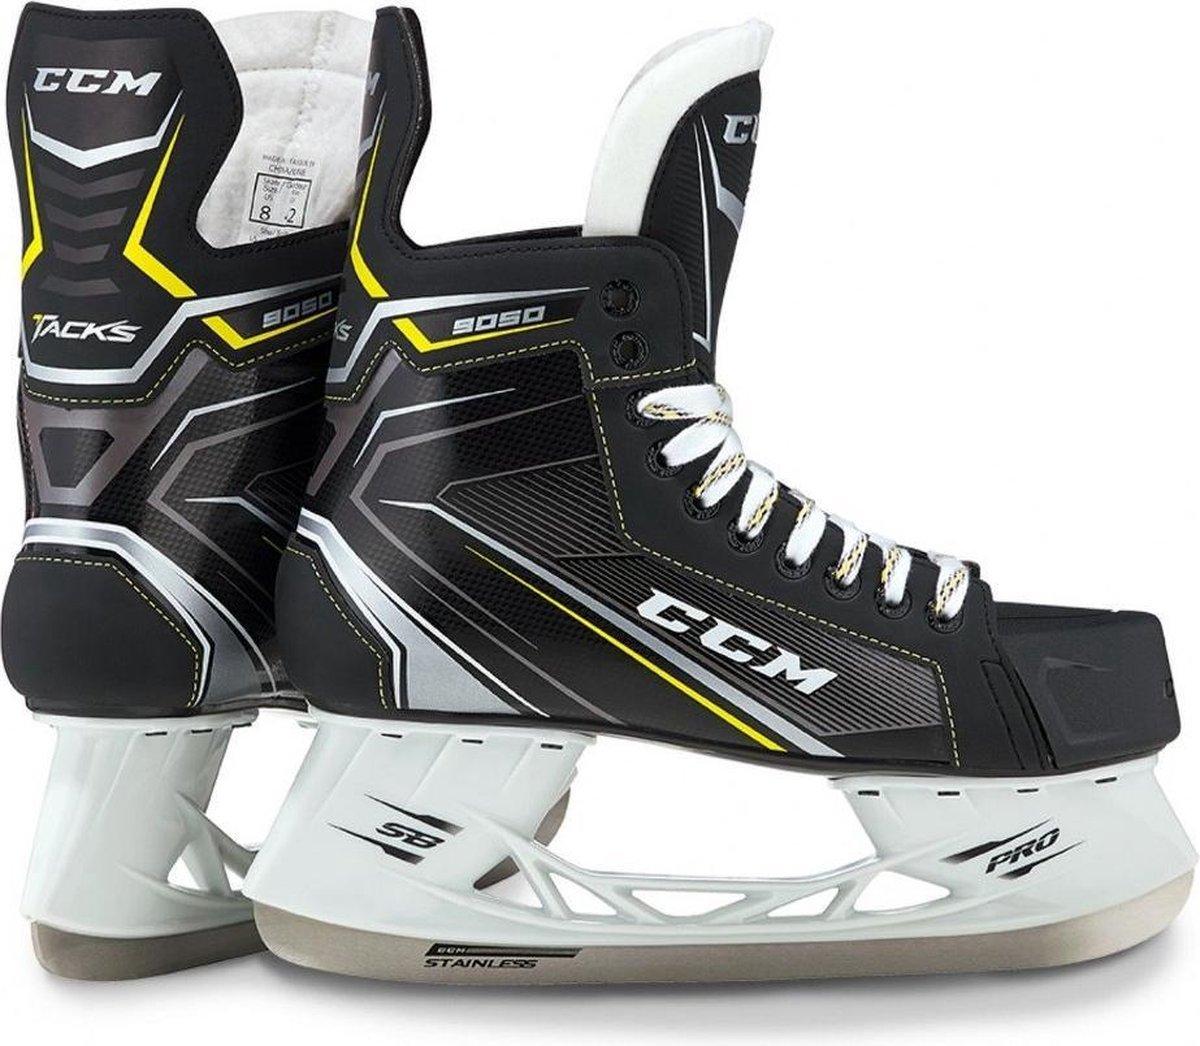 CCM ijshockeyschaatsen Tacks 9050 Maat 35